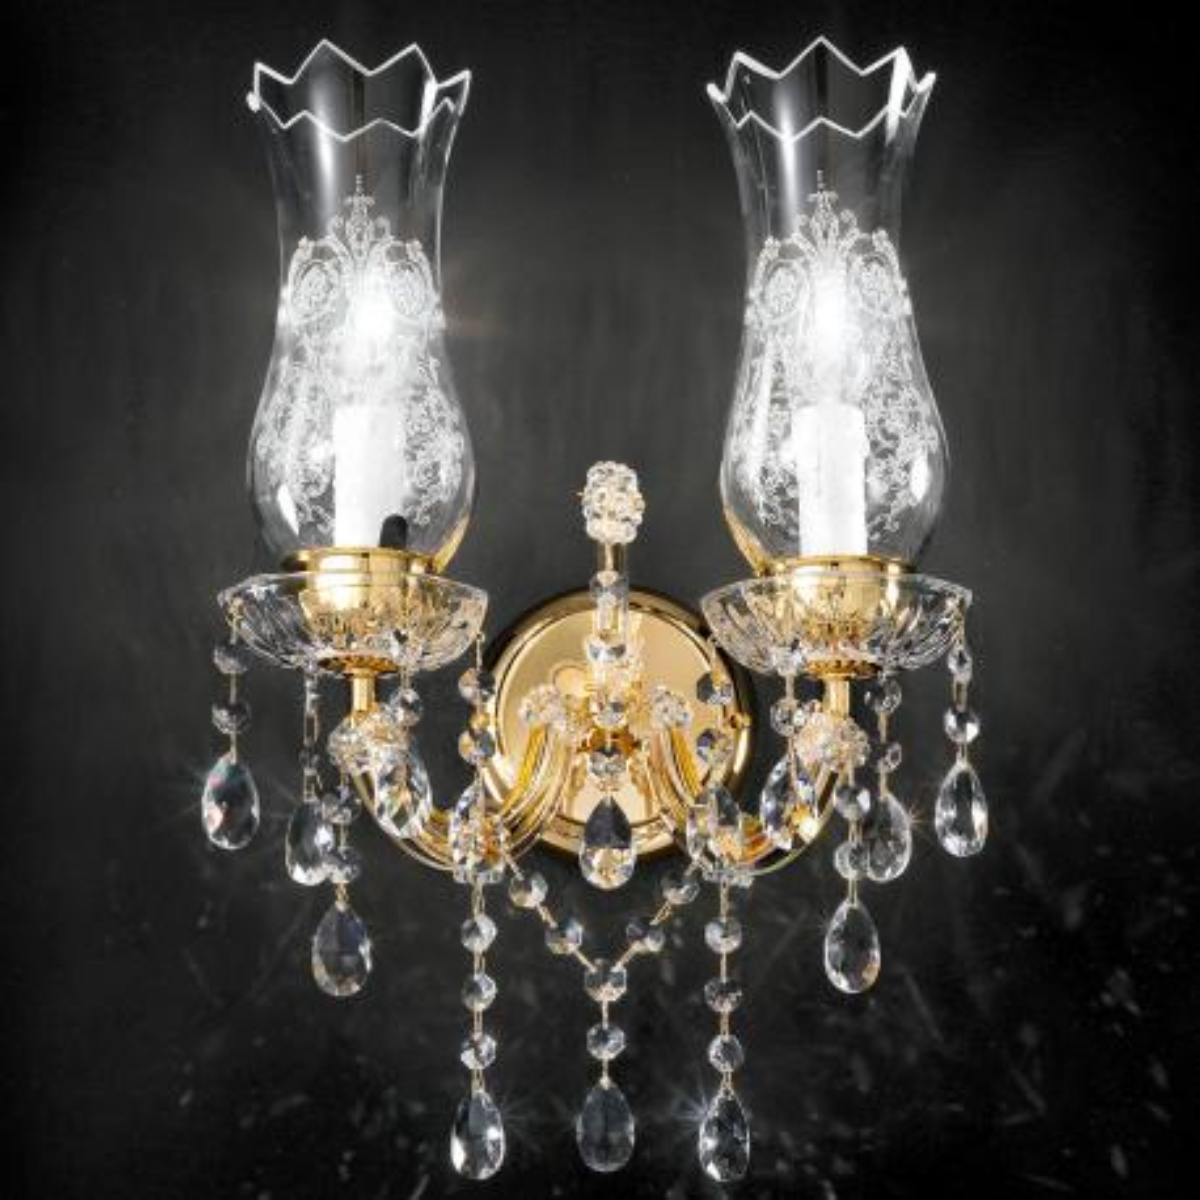 """Michelangelo"" aplique veneciano de pared en cristal - 2 luces - transparente con cristal Asfour"